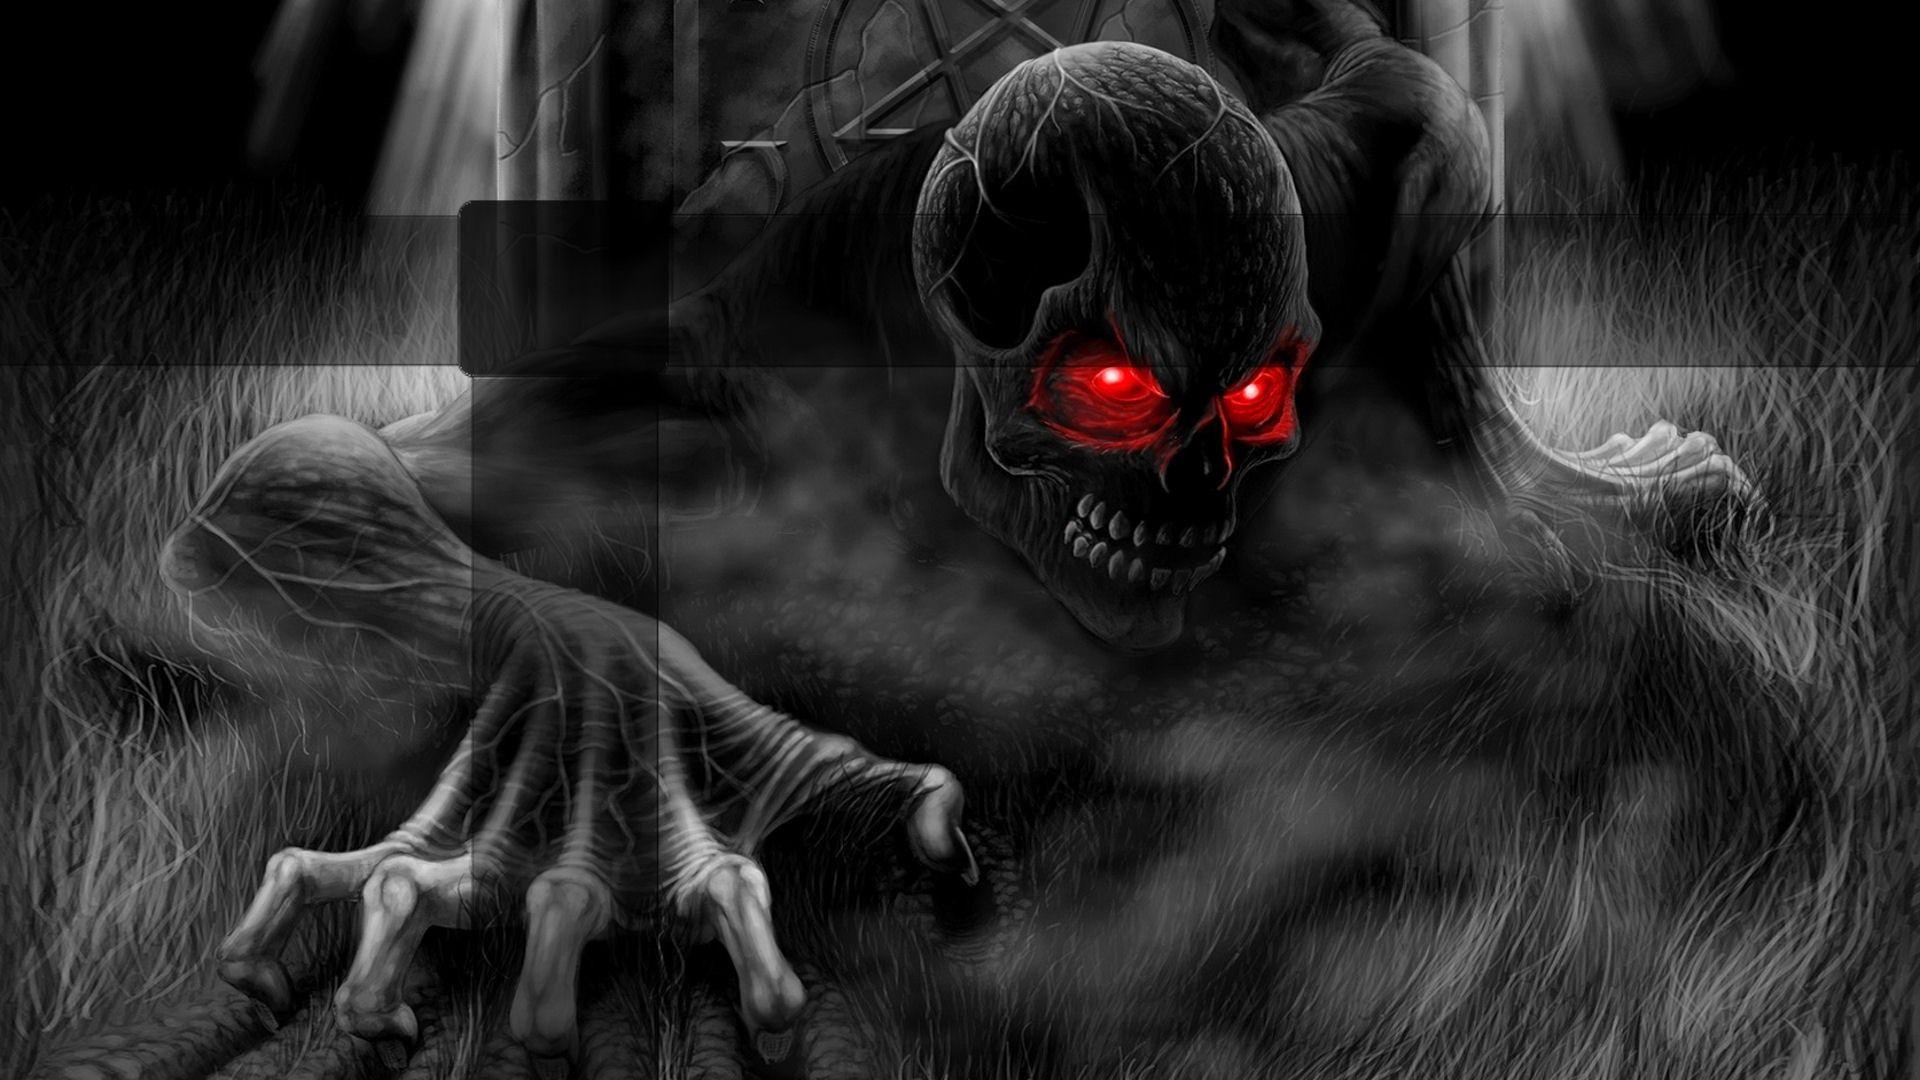 Free Download Scary Hd Wallpaper 1920x1080 Hd 1080p Horror